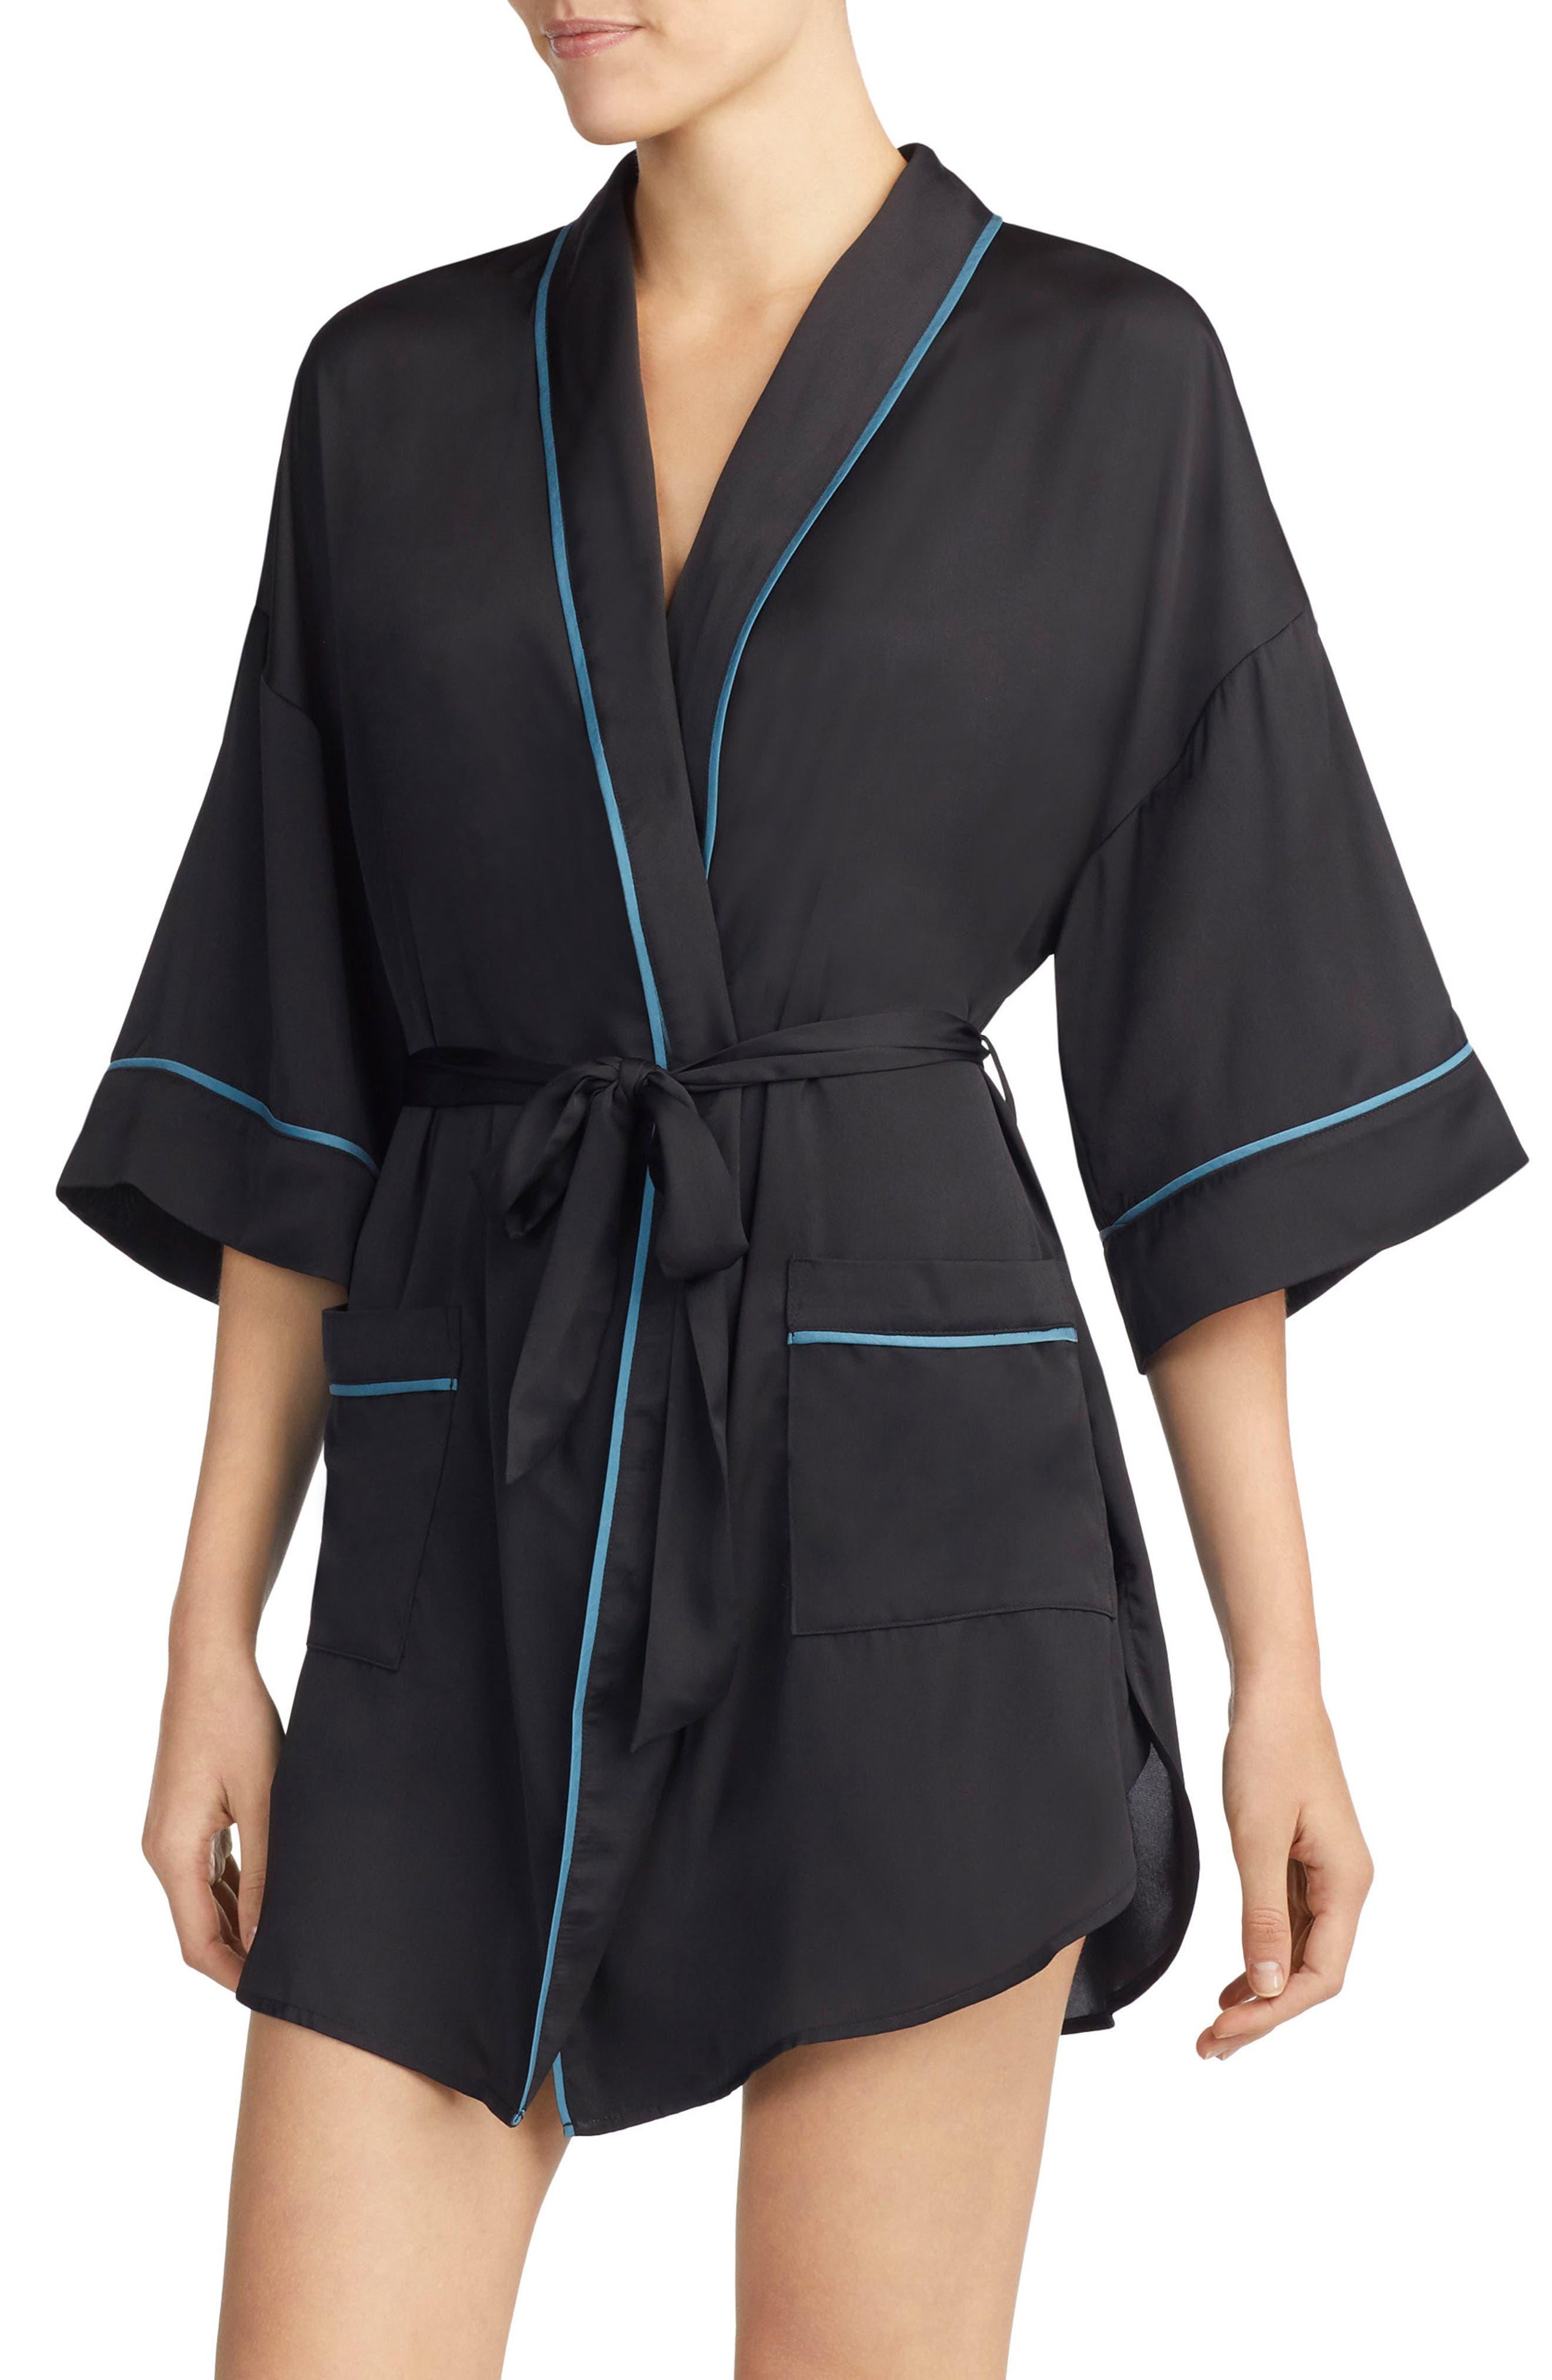 ROOM SERVICE Snake Print Satin Short Robe, Main, color, 001